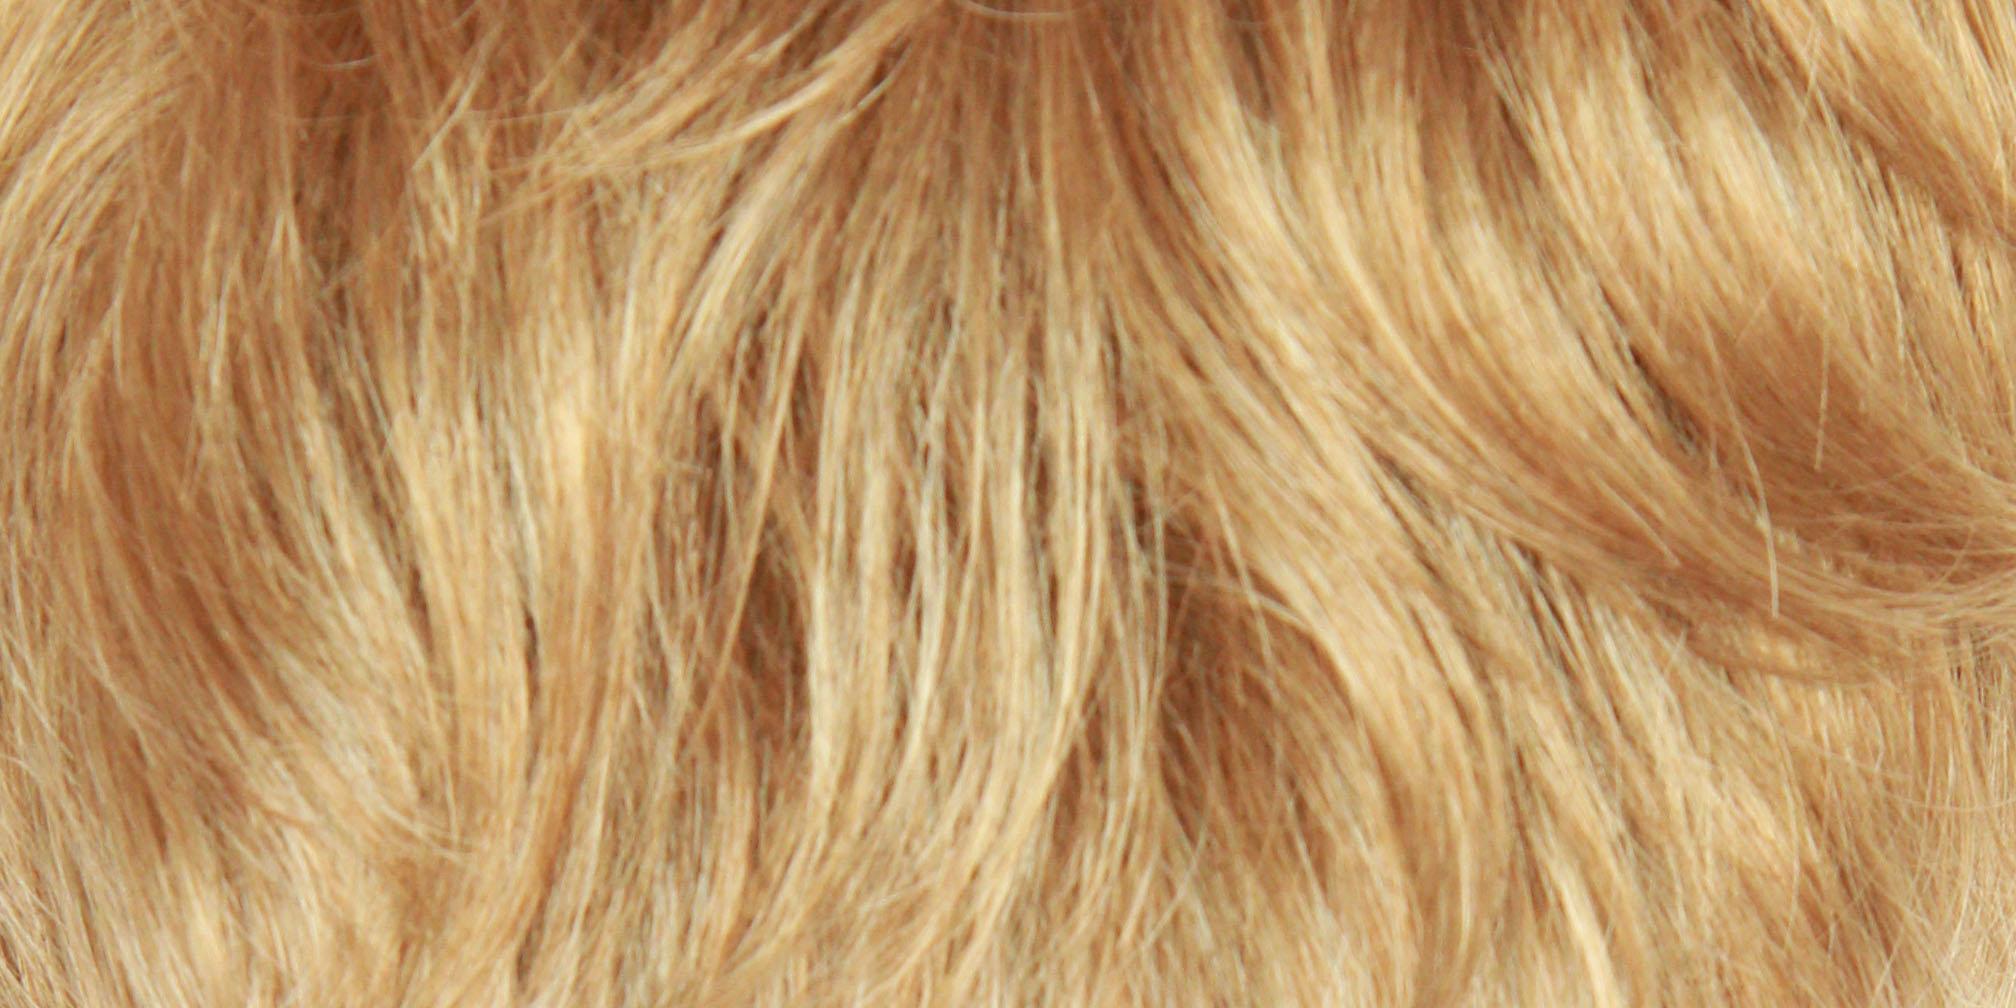 Dark Strawberry Blonde Hair Color Chart Strawberry blonde sp